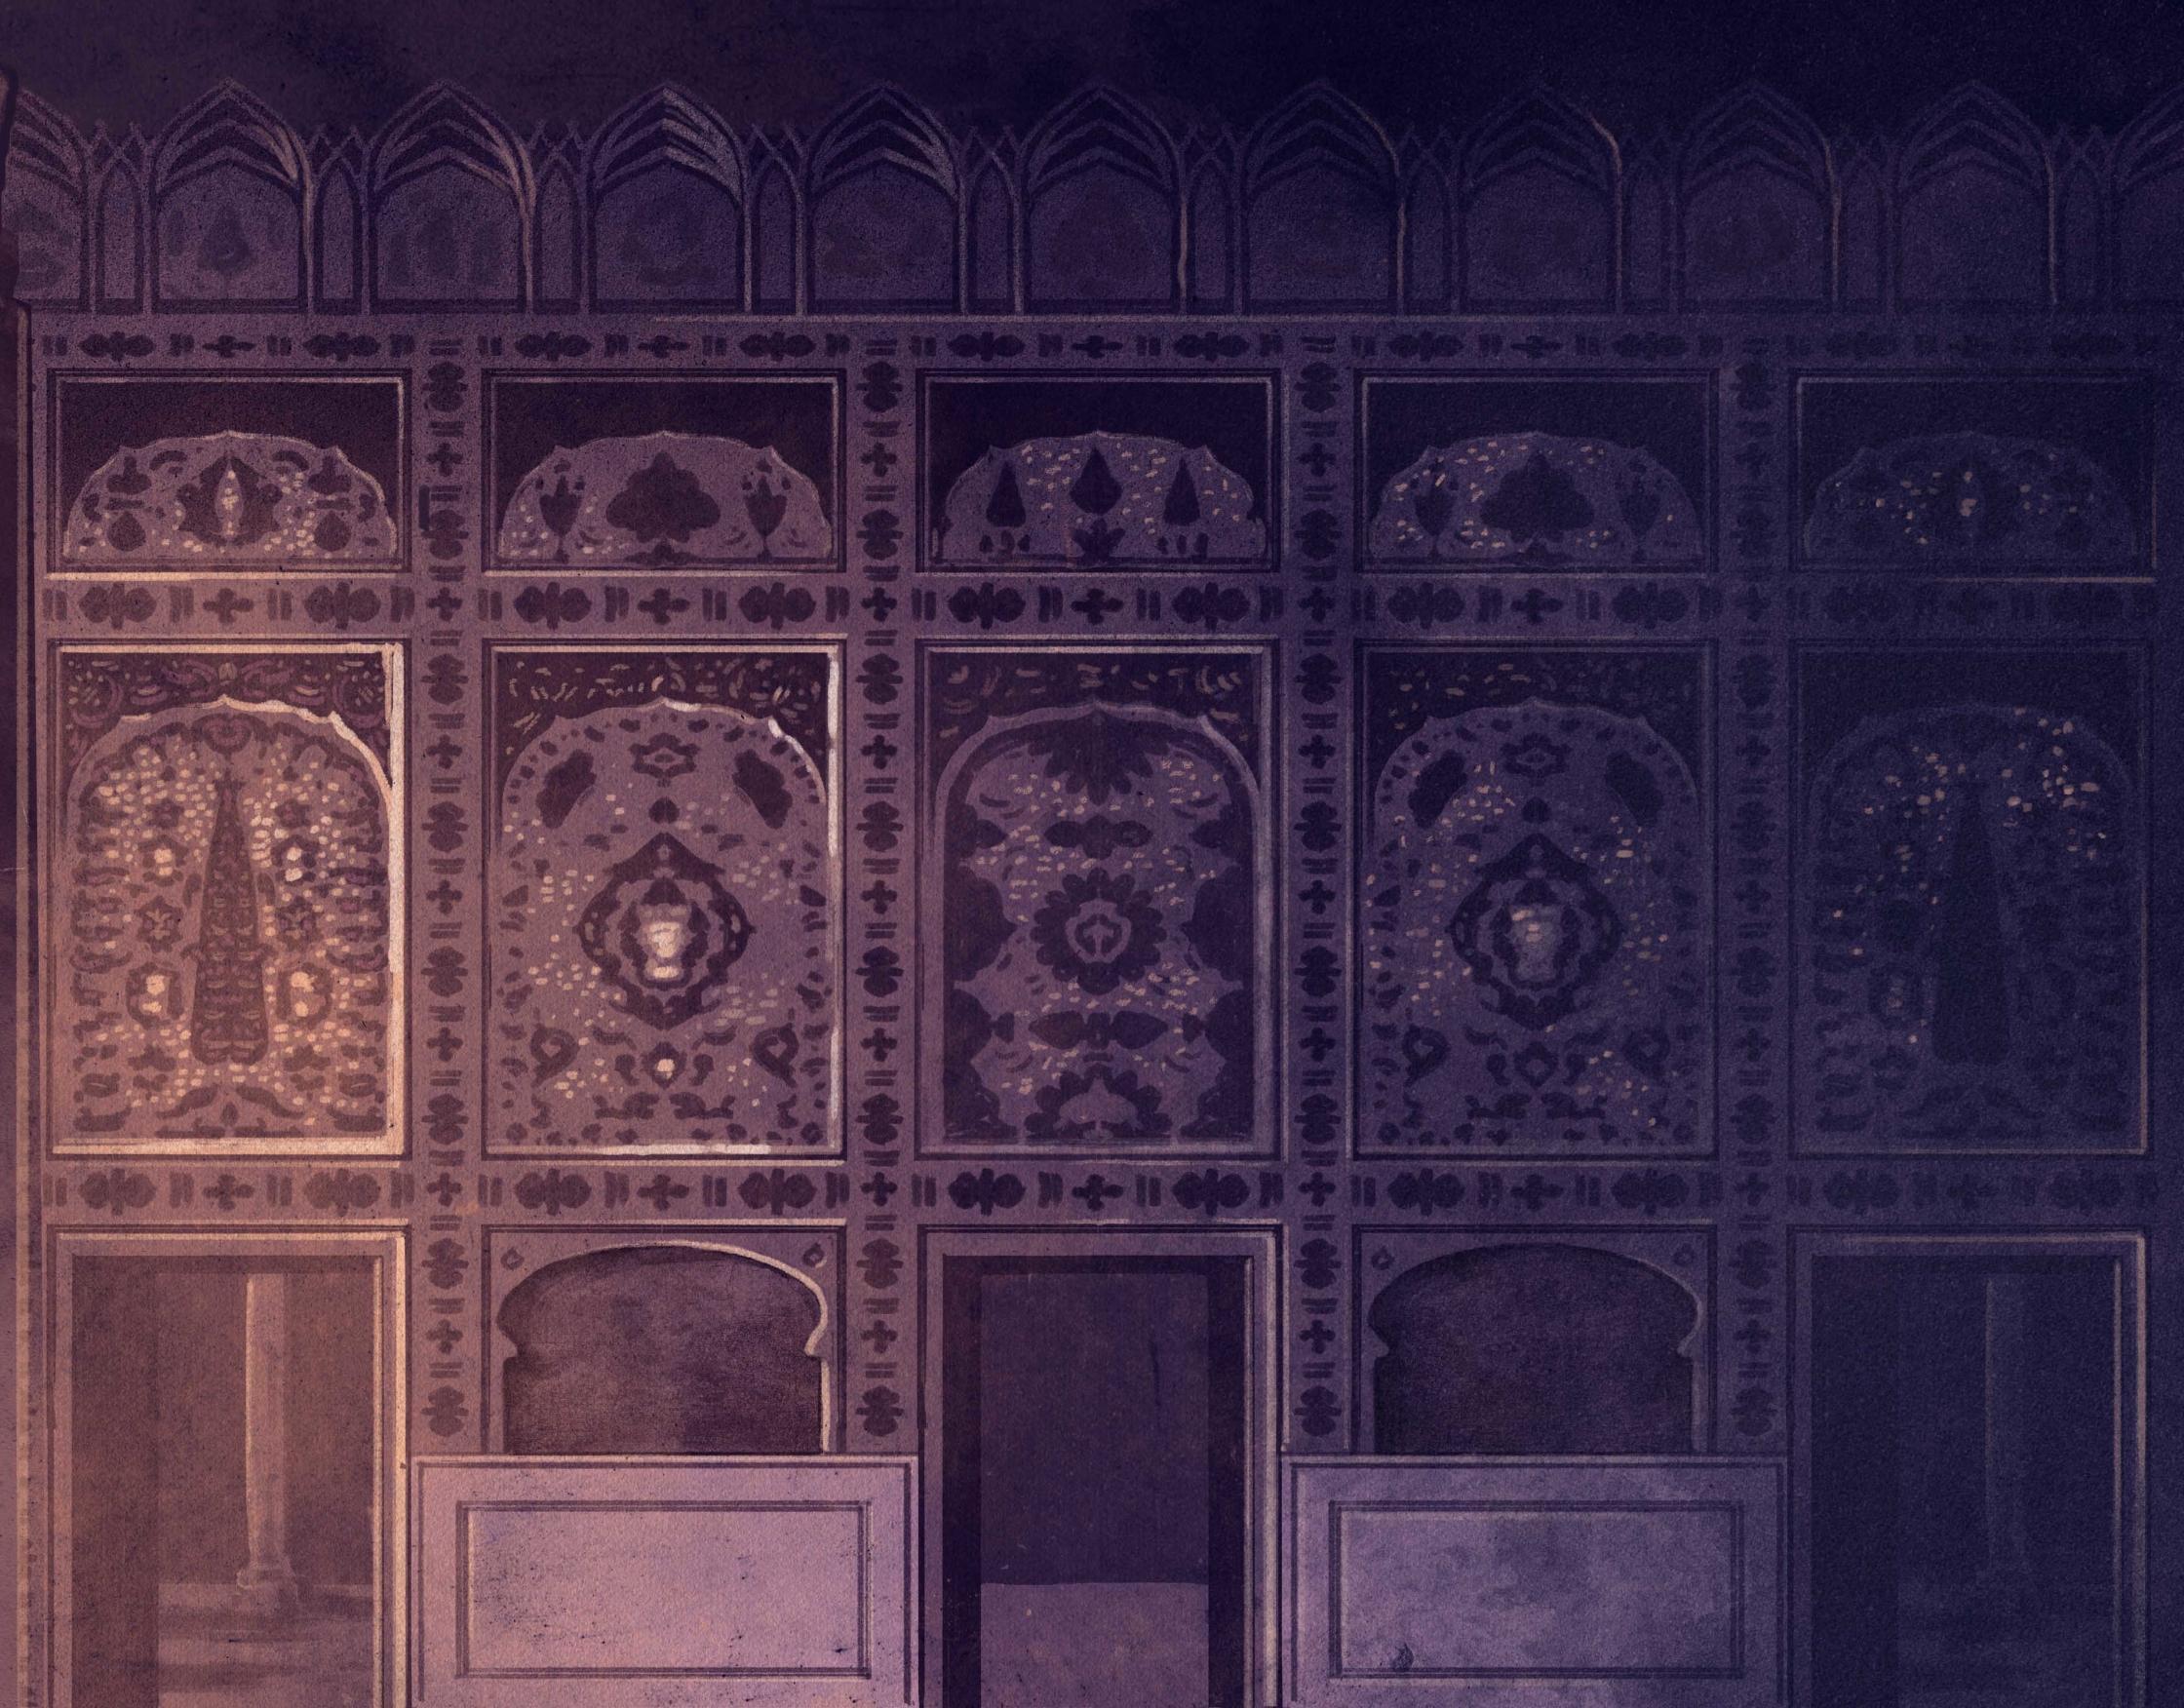 Theatre Backdrop mughal court cyc.jpg